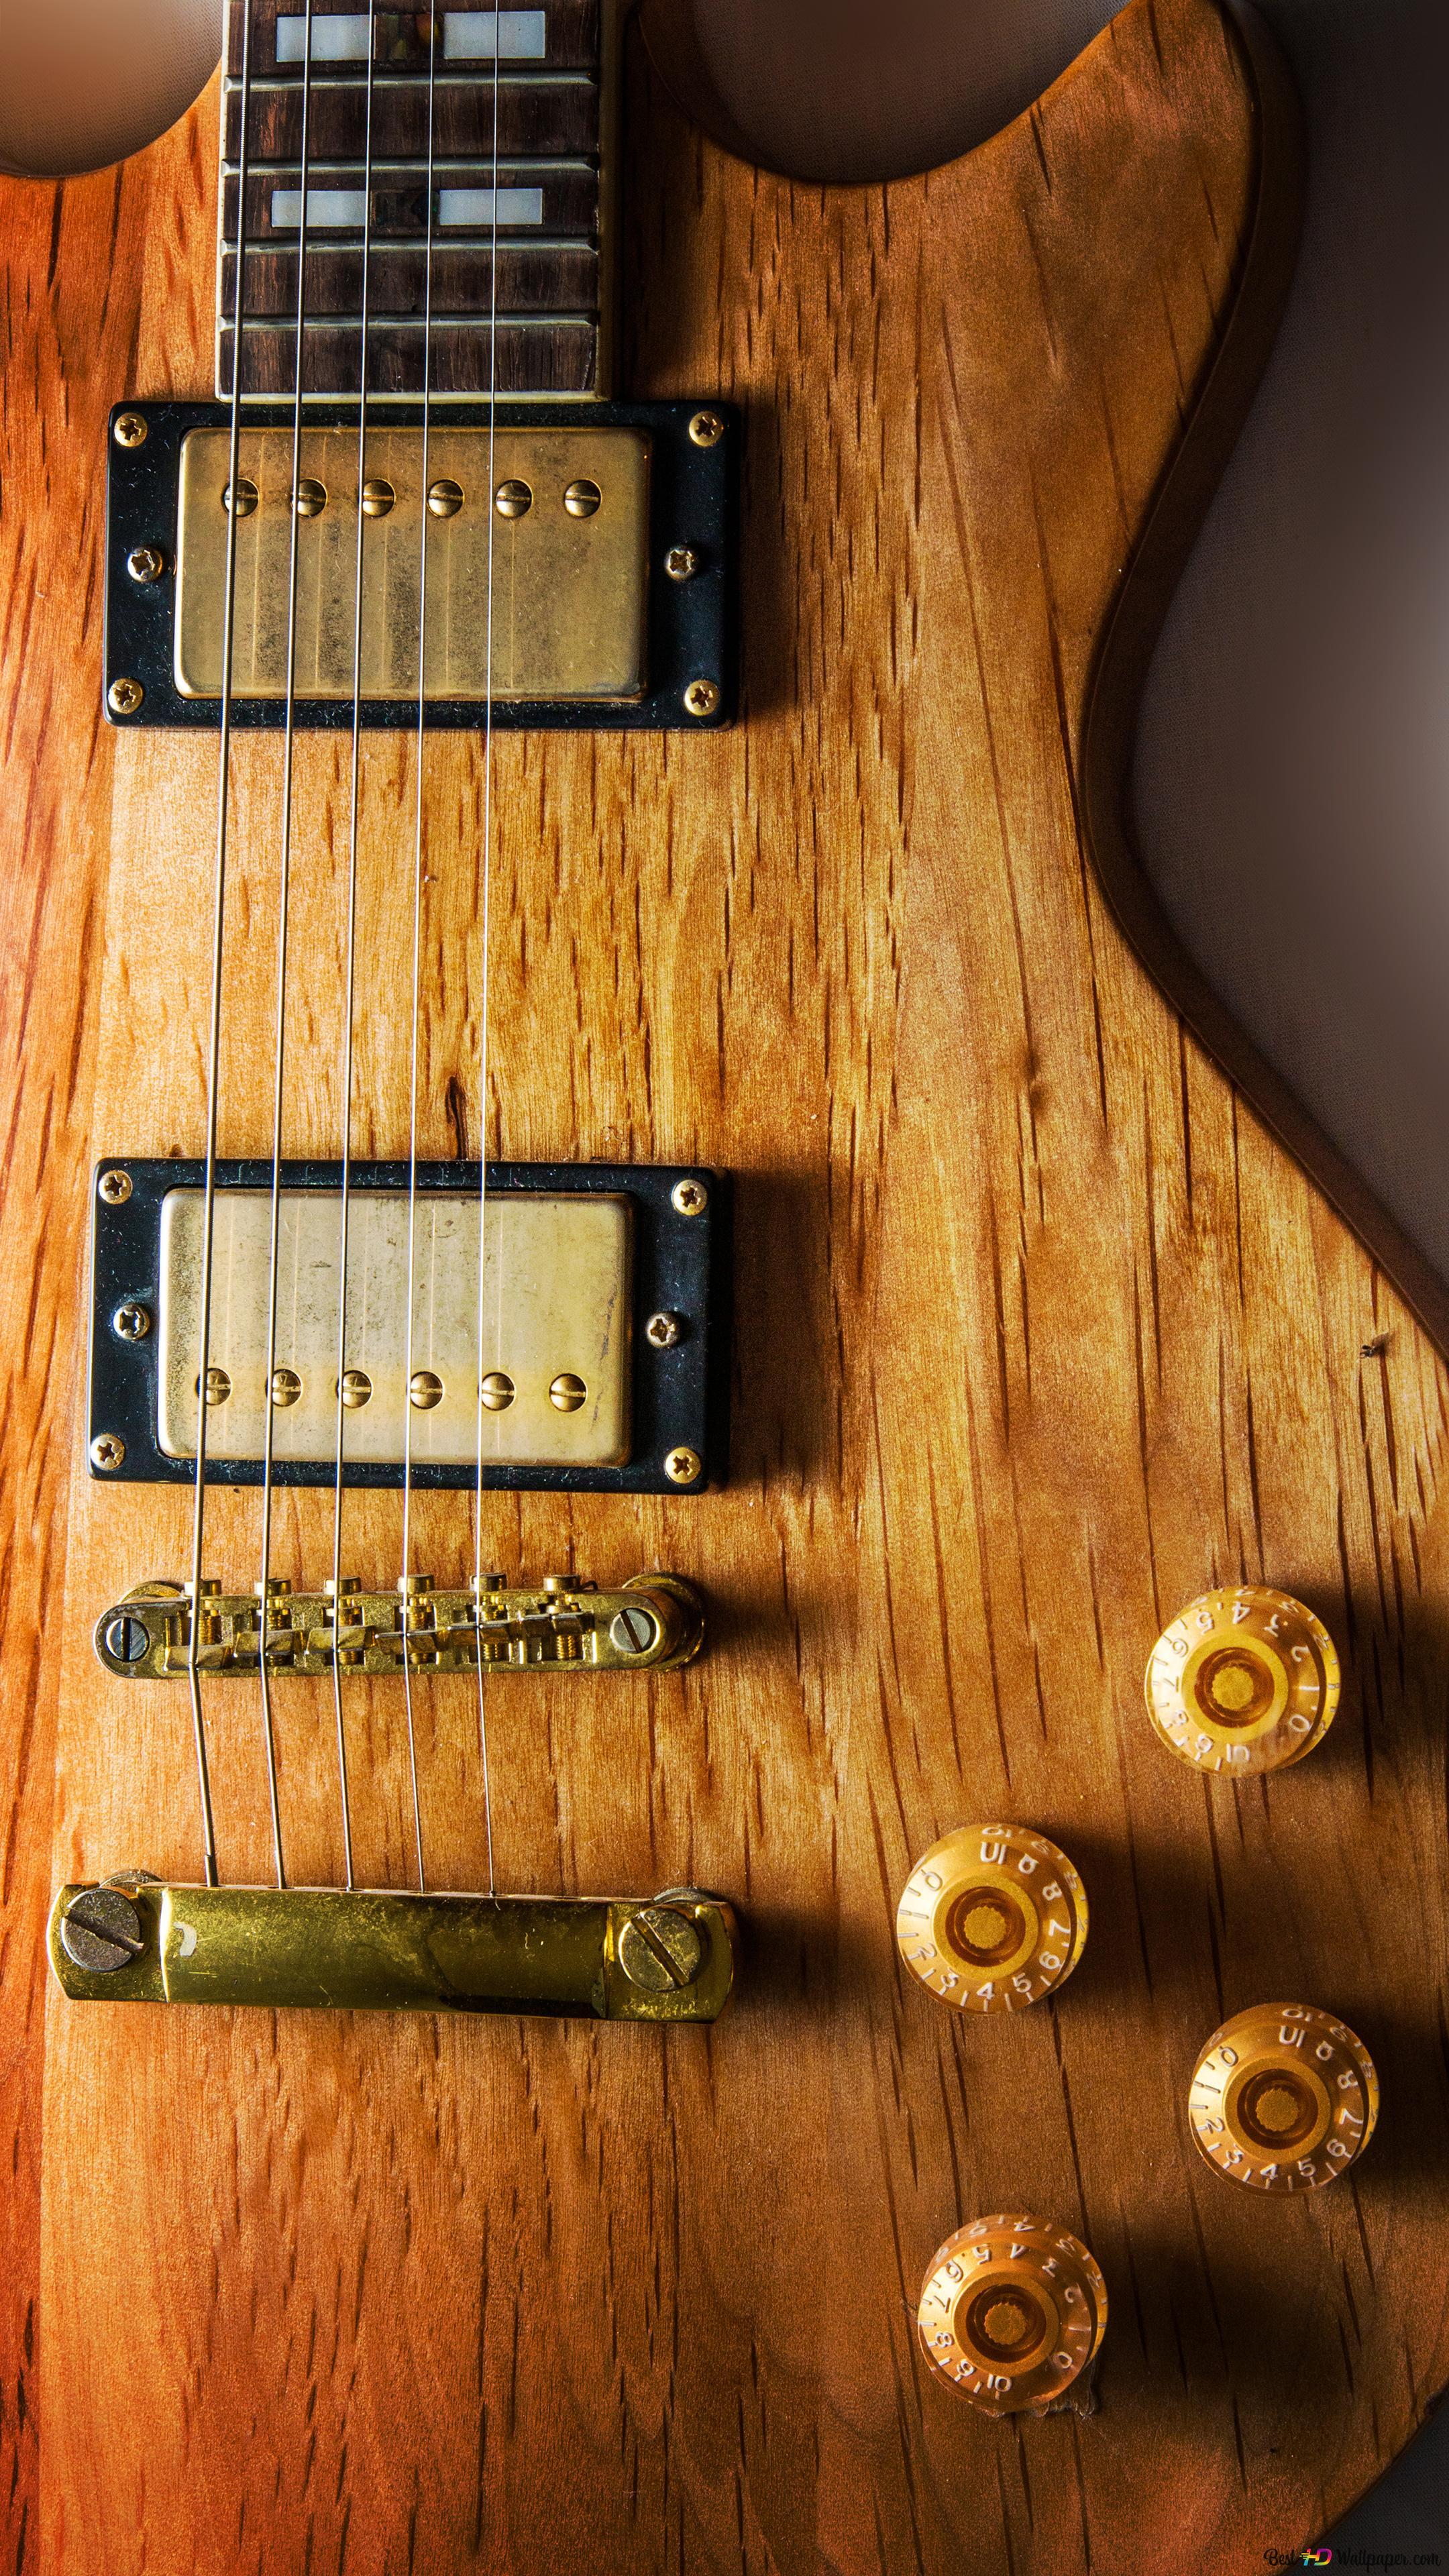 Wooden electric guitar HD wallpaper